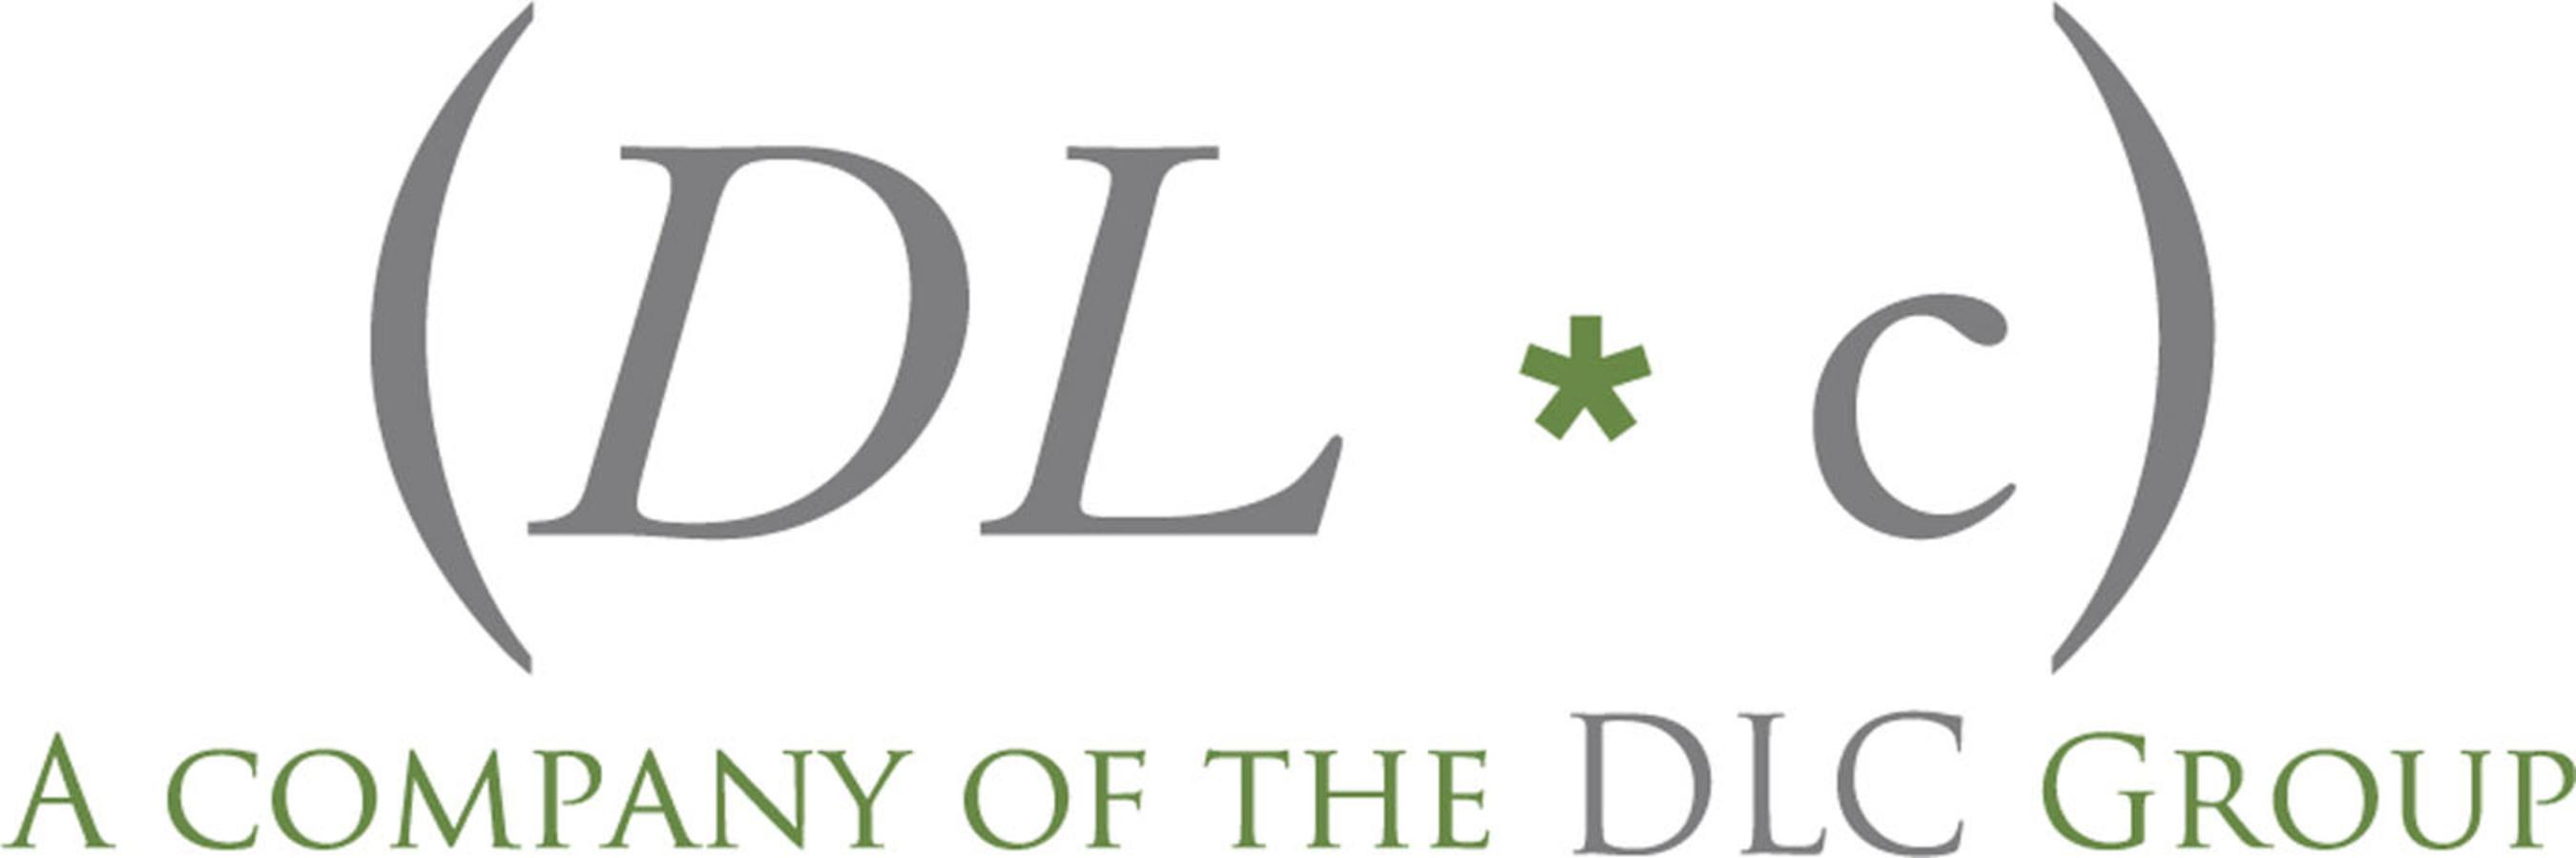 DLC - A Company of The DLC Group